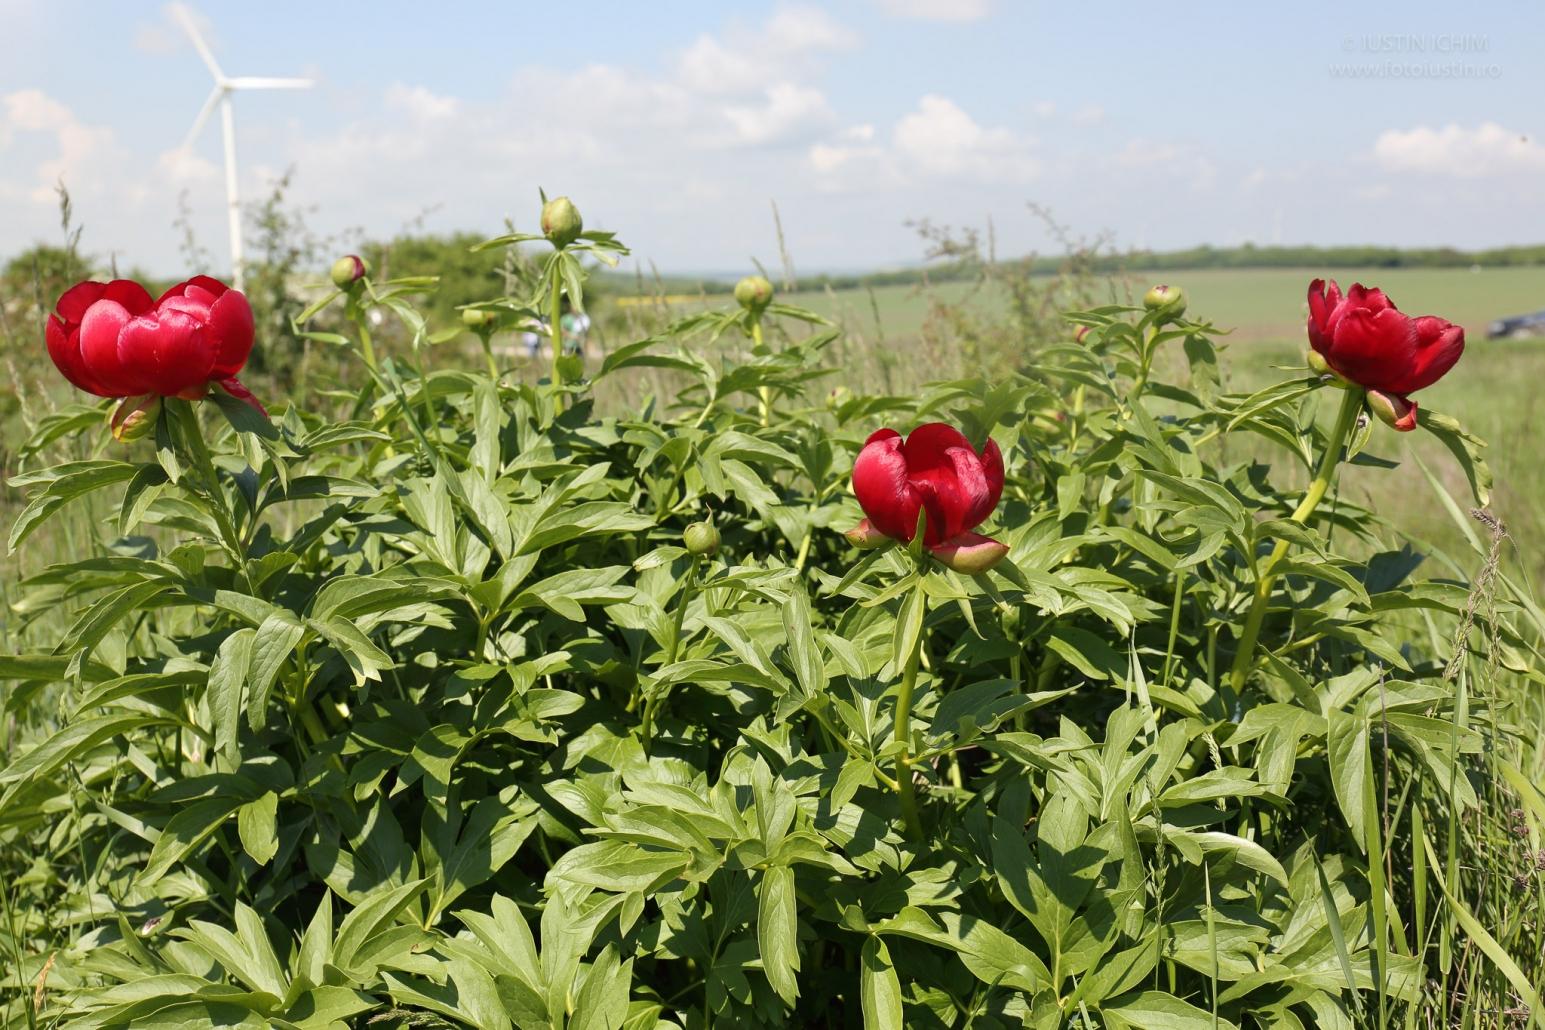 Bujorul sălbatic românesc, Paeonia peregrina Mill. var. romanica, Dobrogea